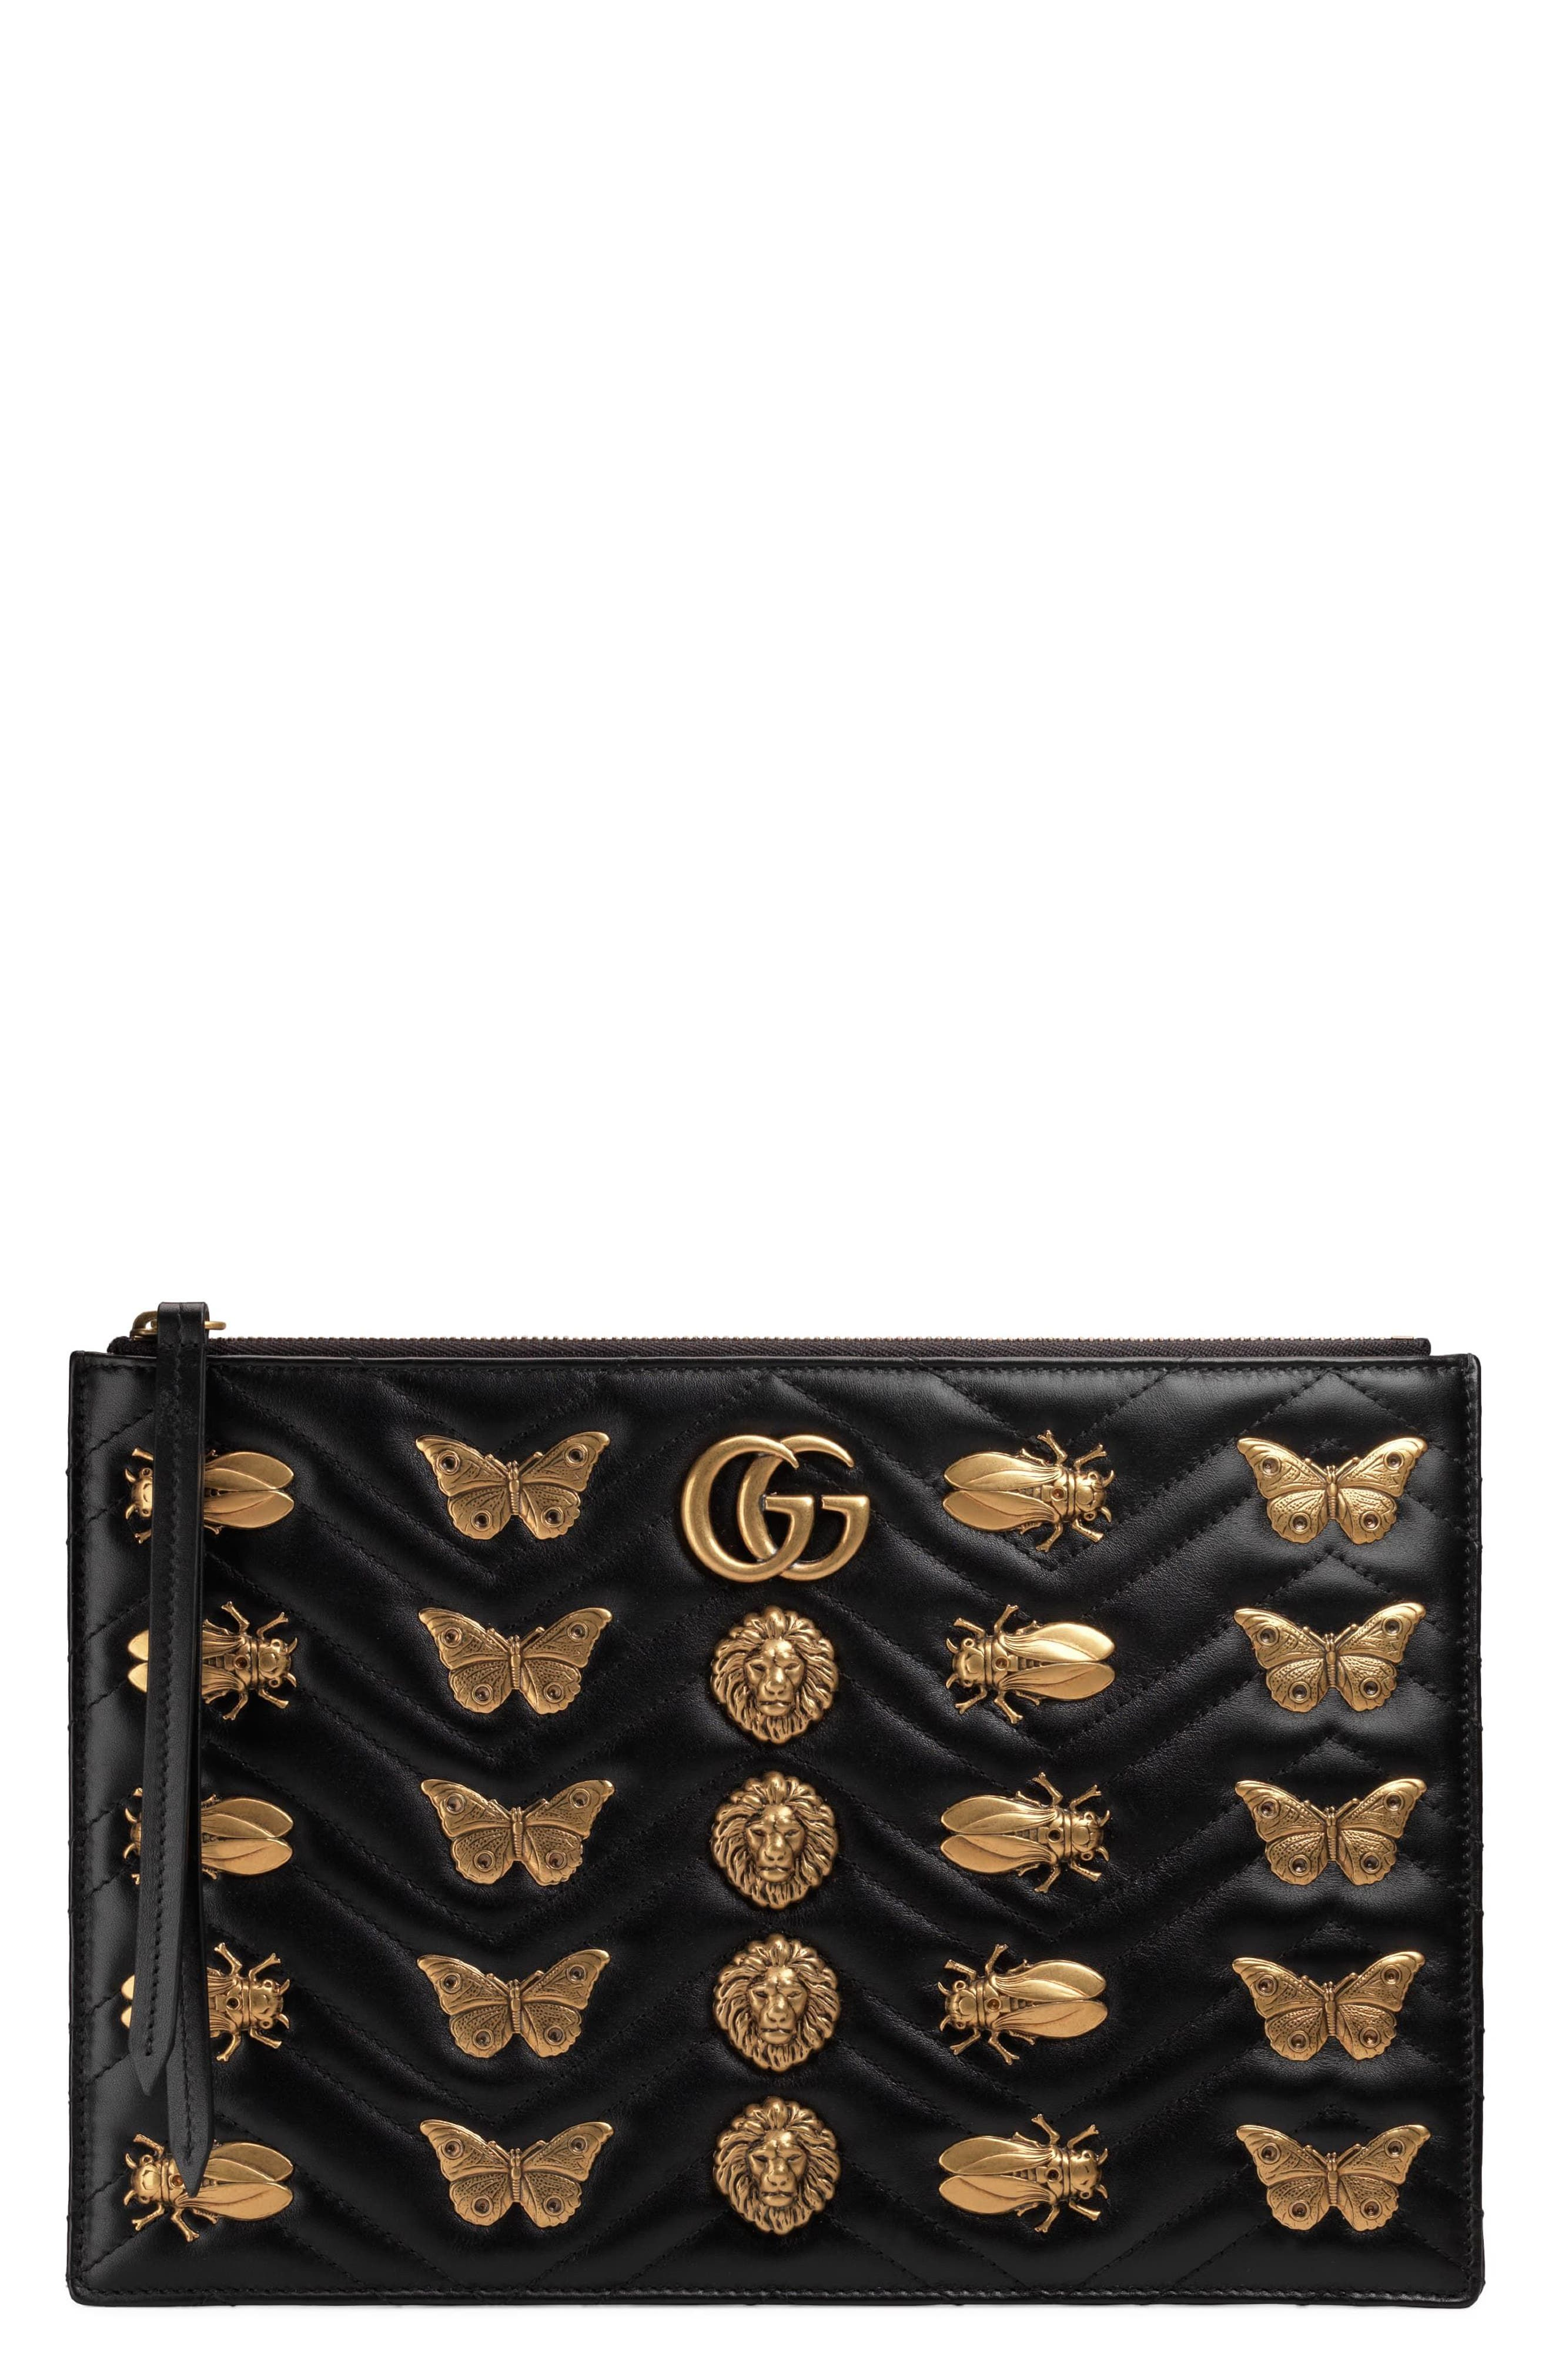 Main Image - Gucci GG Marmont 2.0 Animal Stud Matelassé Leather Pouch